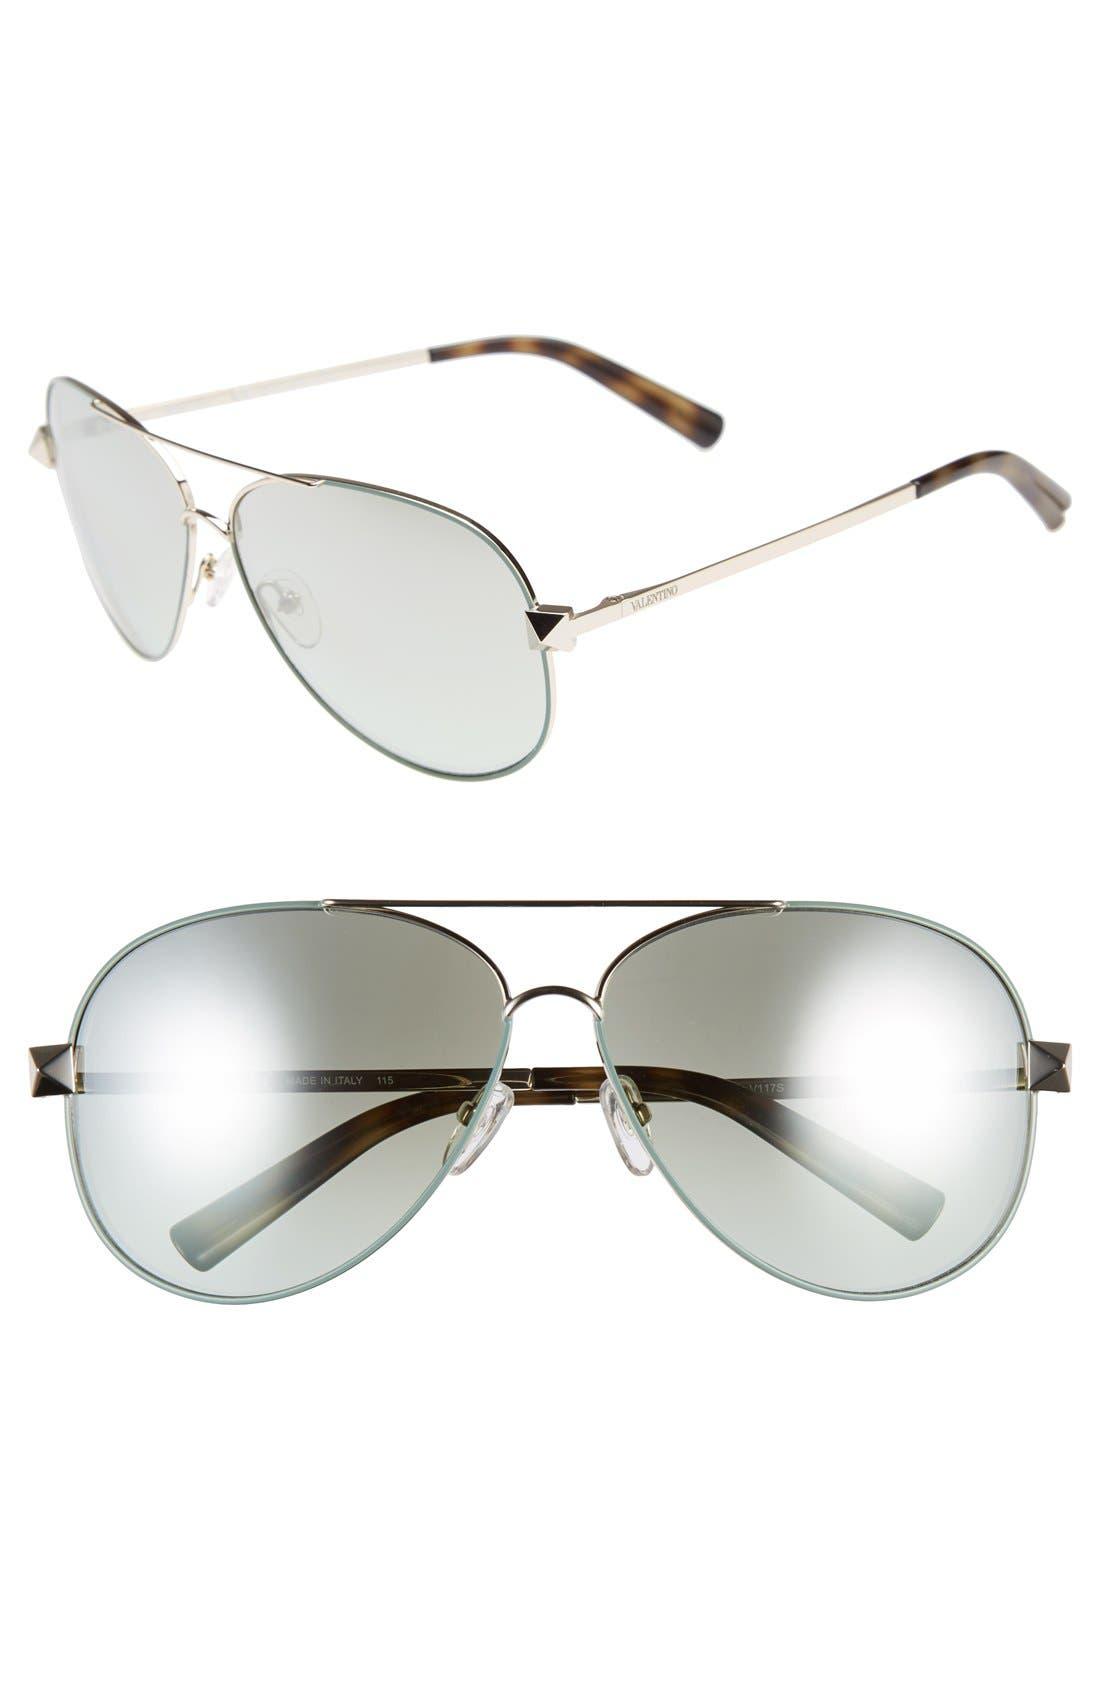 Main Image - Valentino 'Rockstud' 61mm Aviator Sunglasses